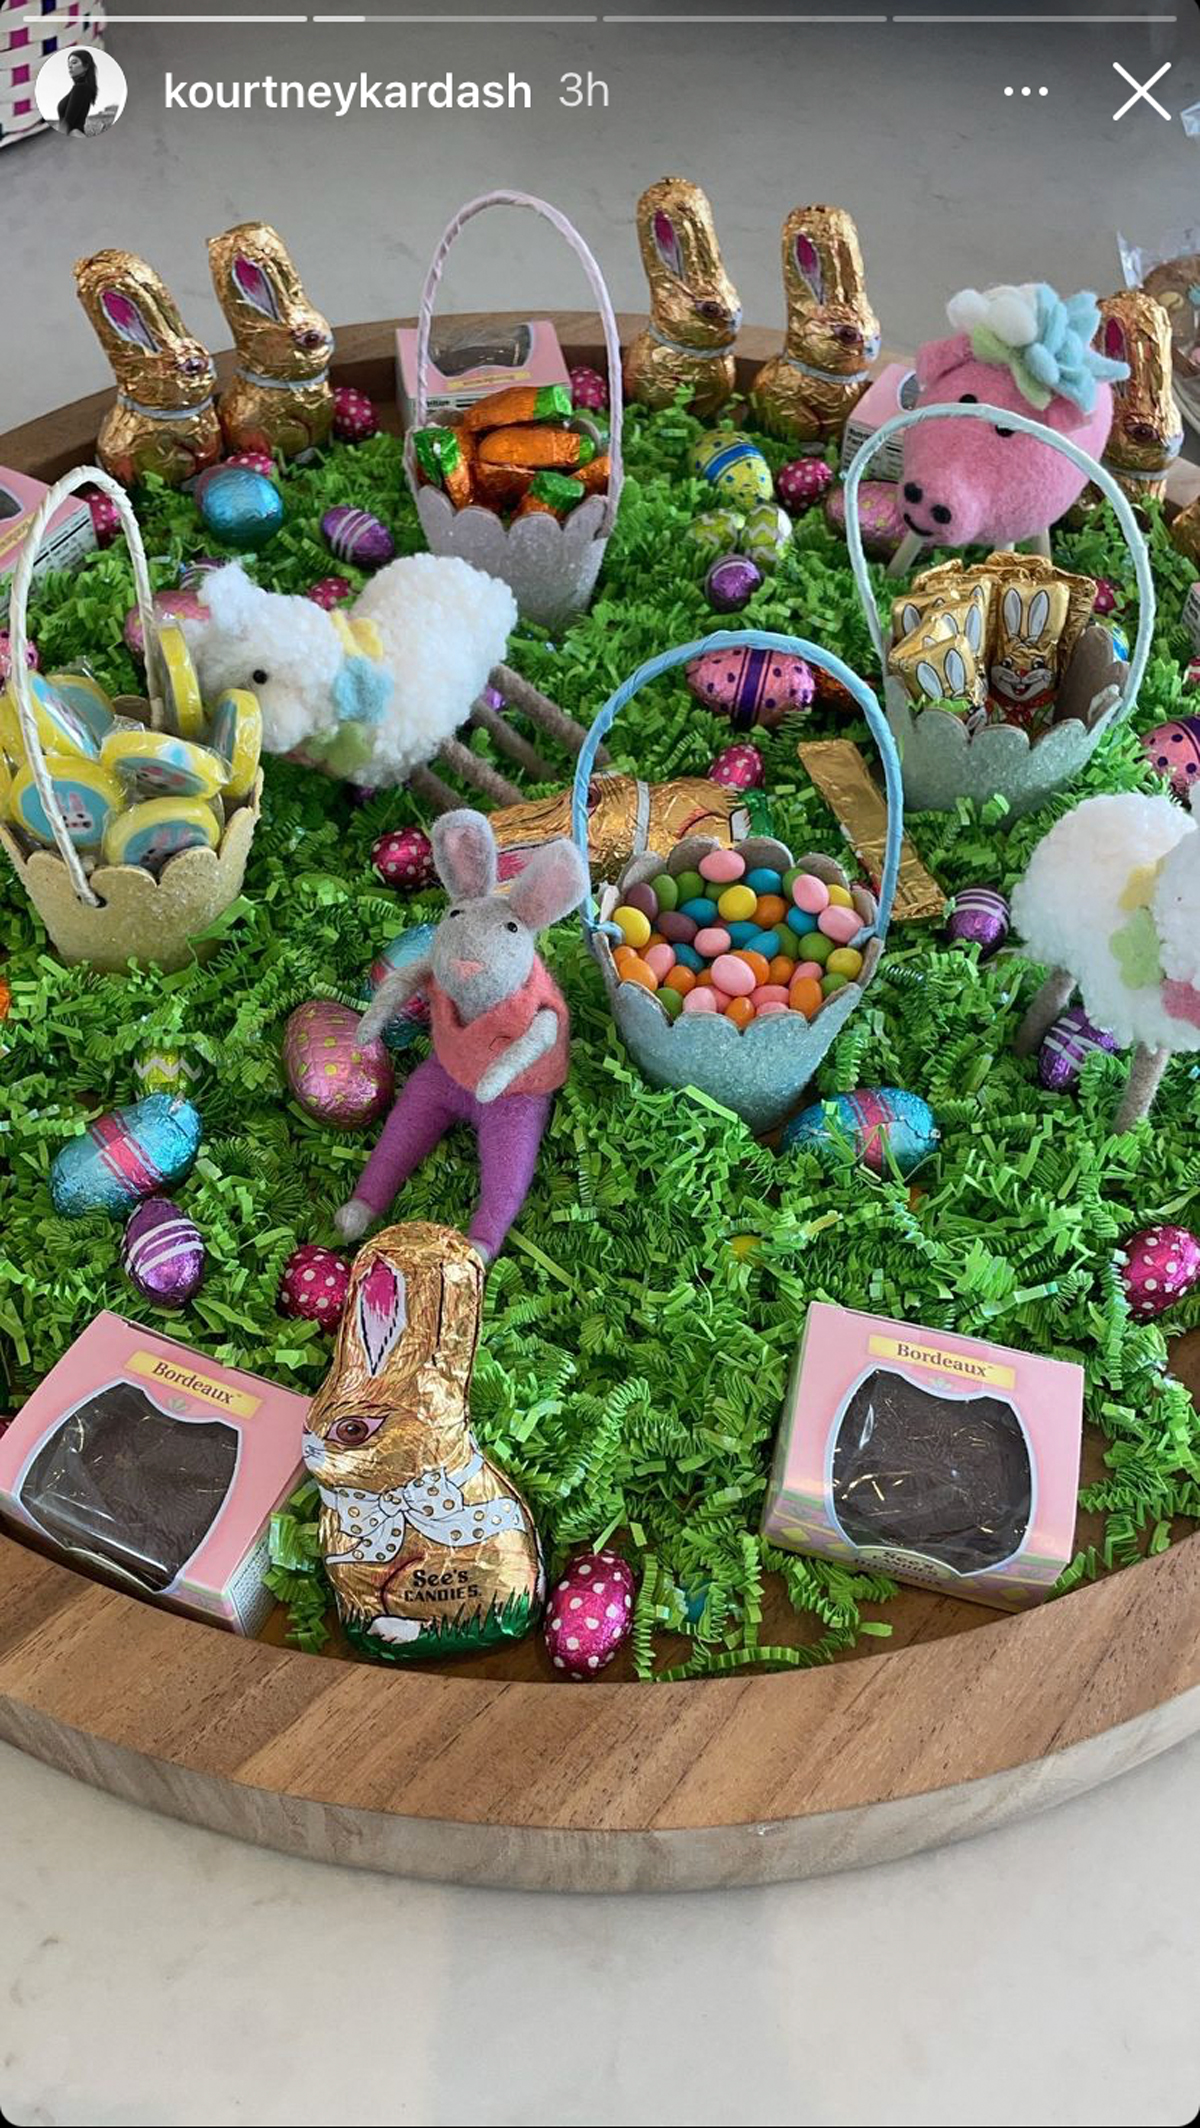 Travis Barker Joins The Kardashian-Jenner For A Sweet Easter Celebration!